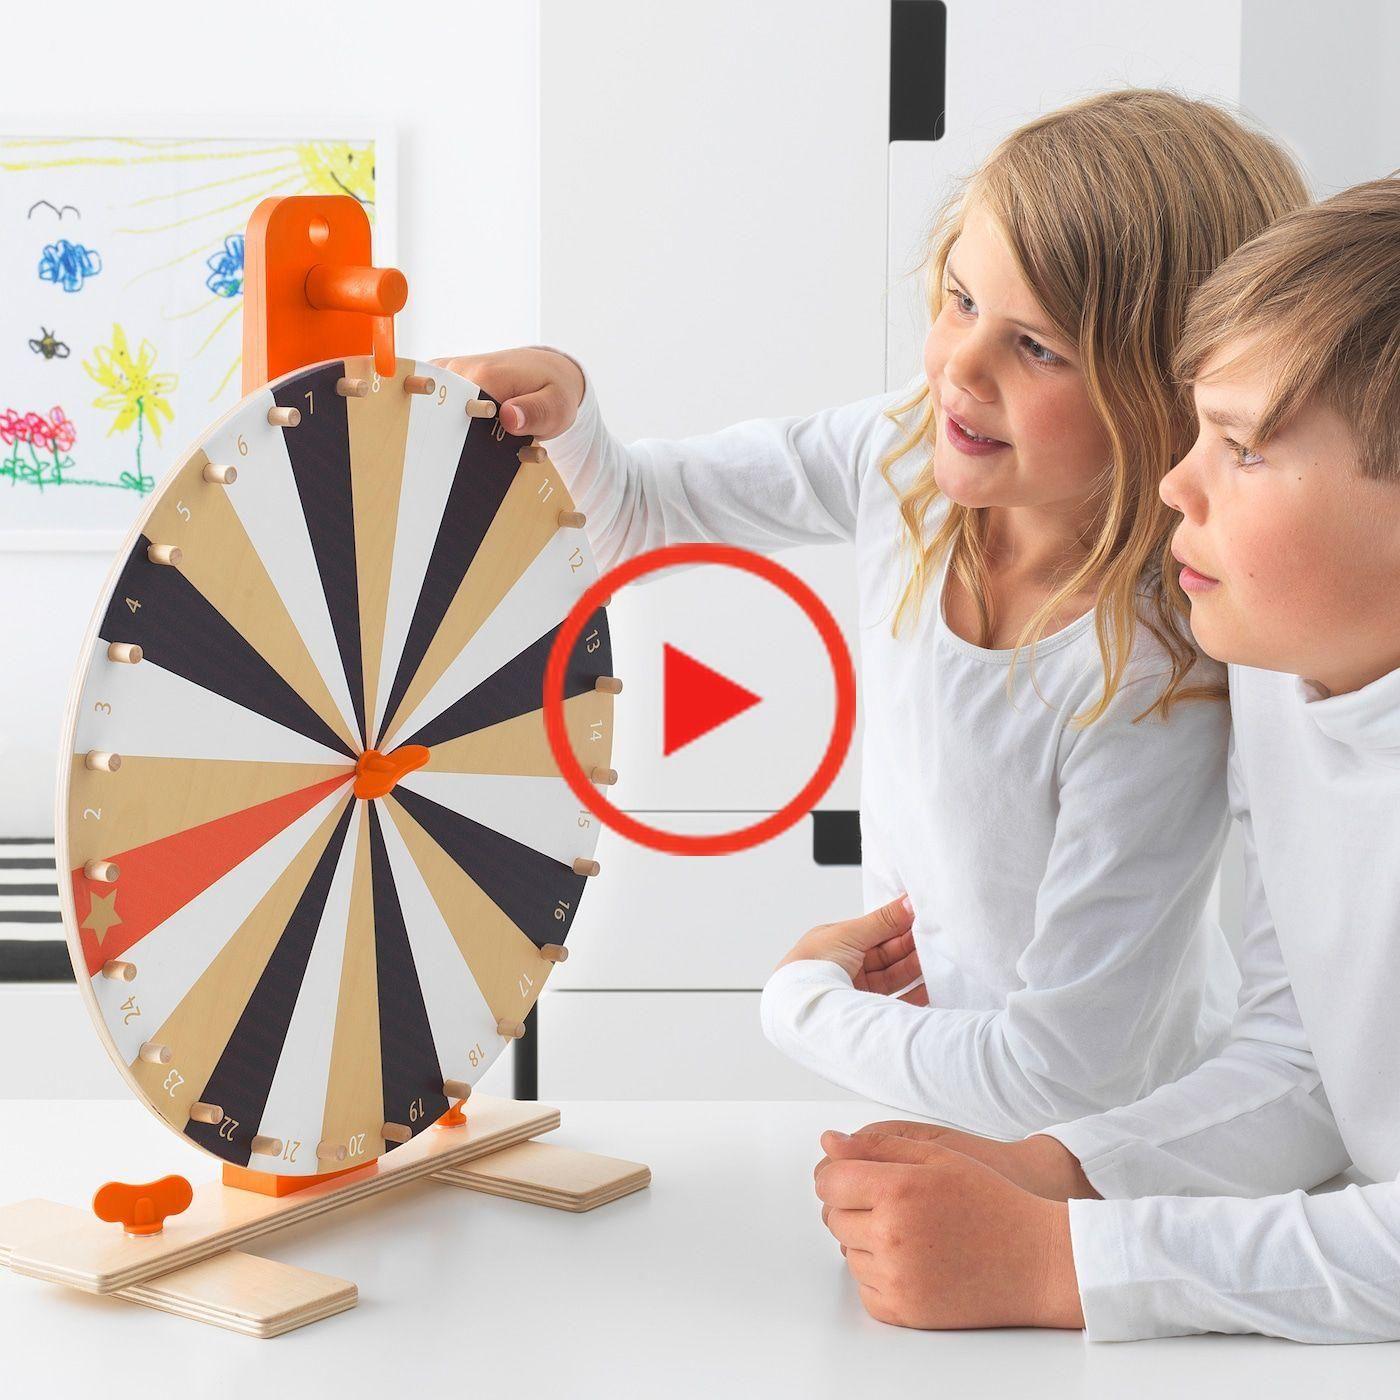 LUSTIGT Prize wheel game IKEA in 2020 Prize wheel